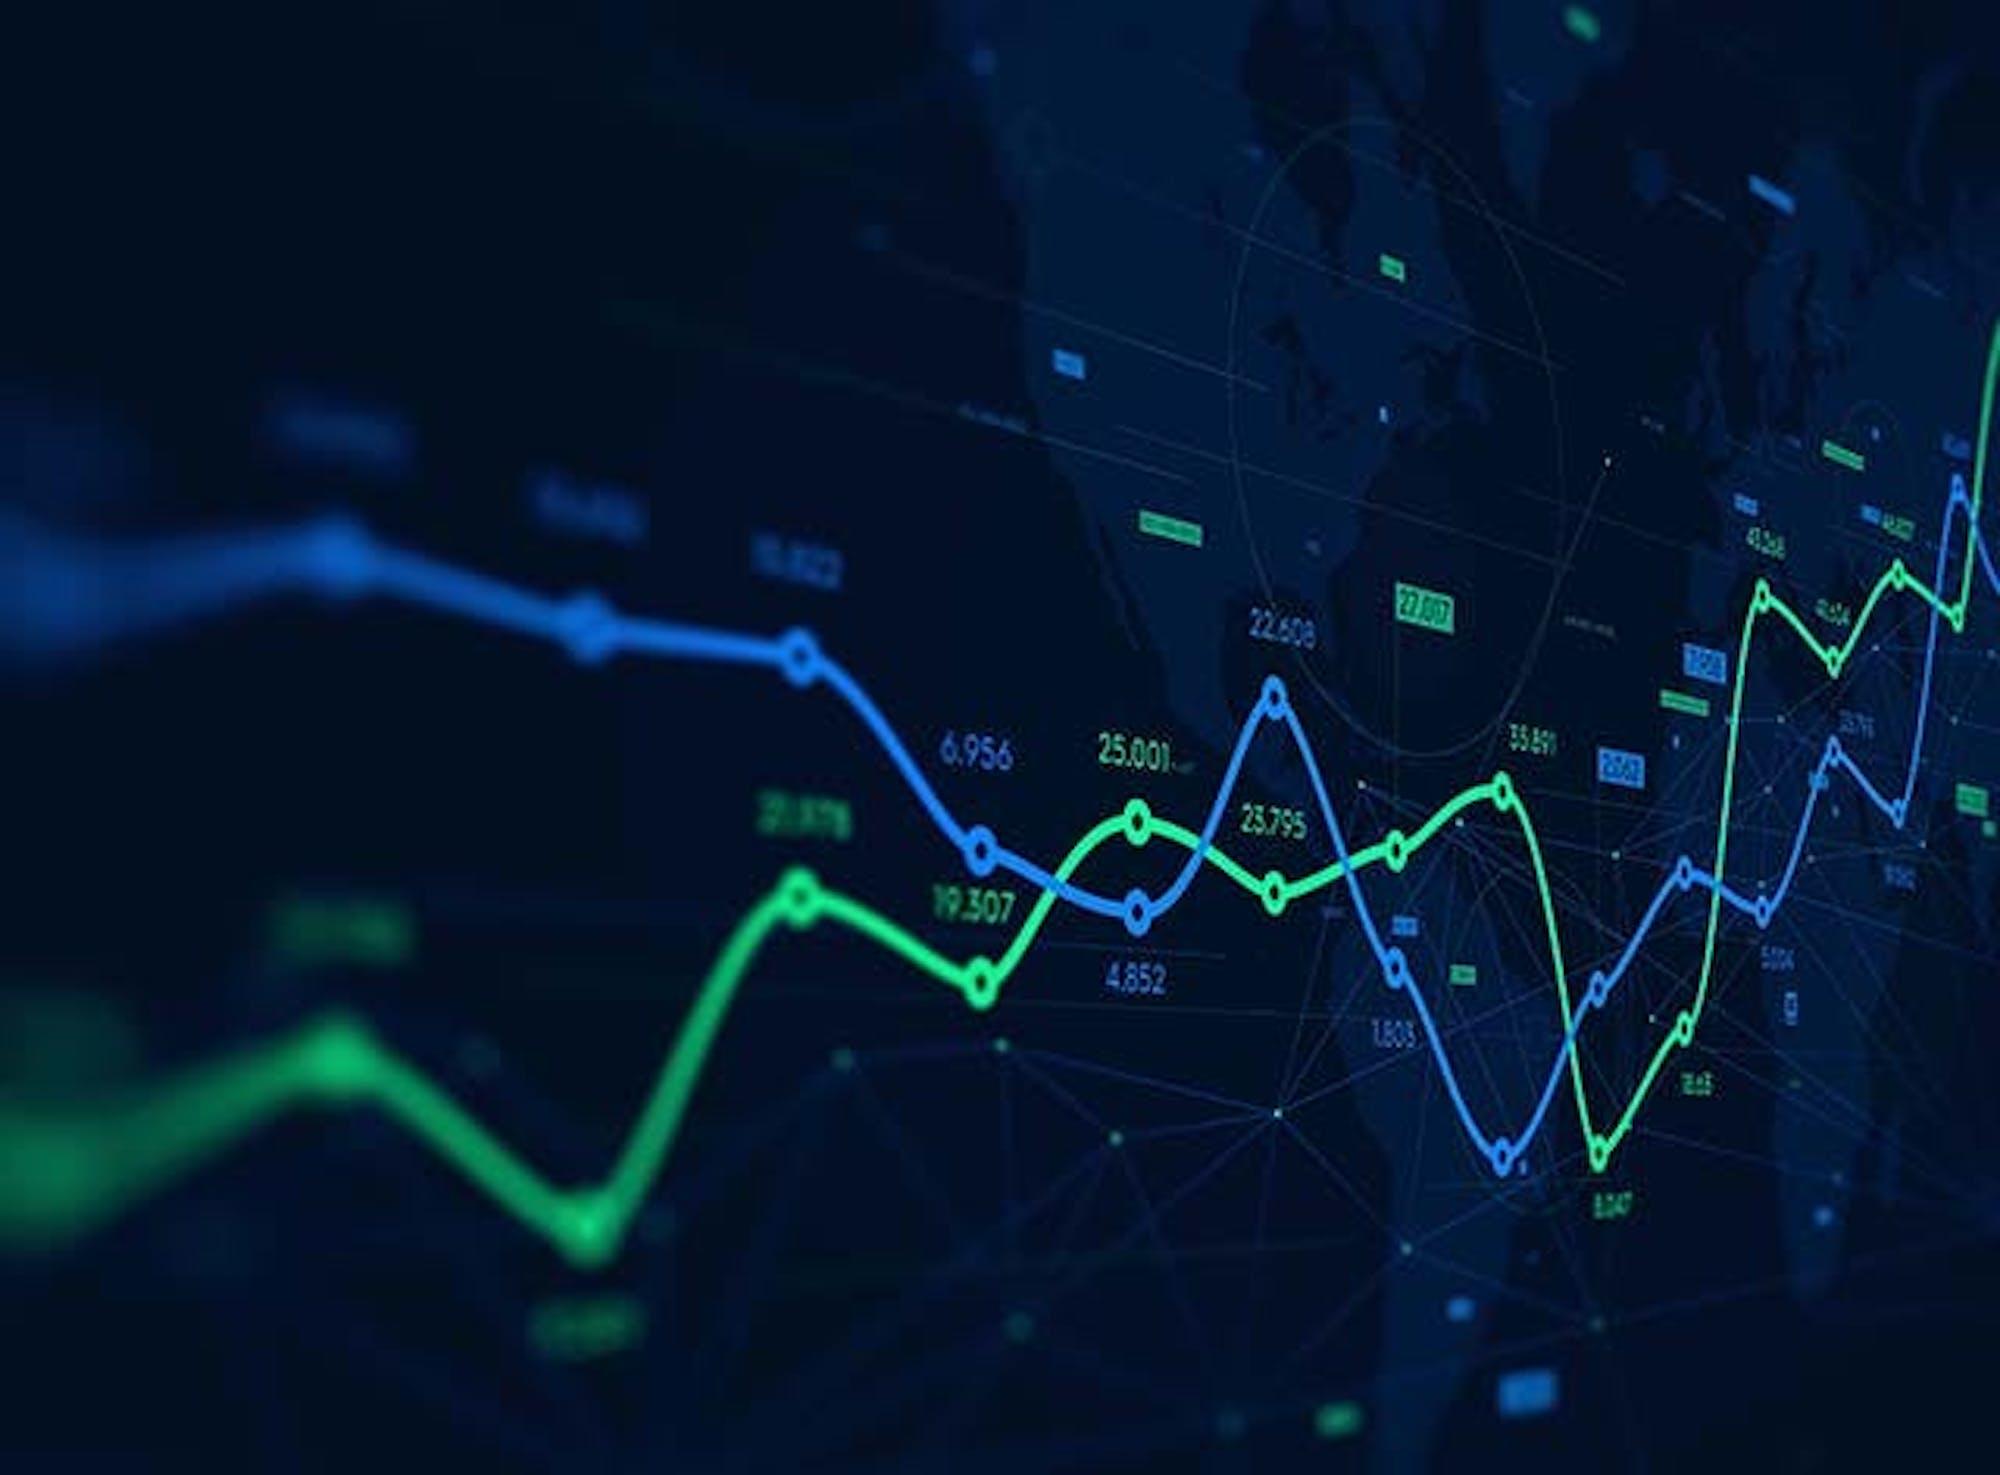 Analytics & Reporting Tools